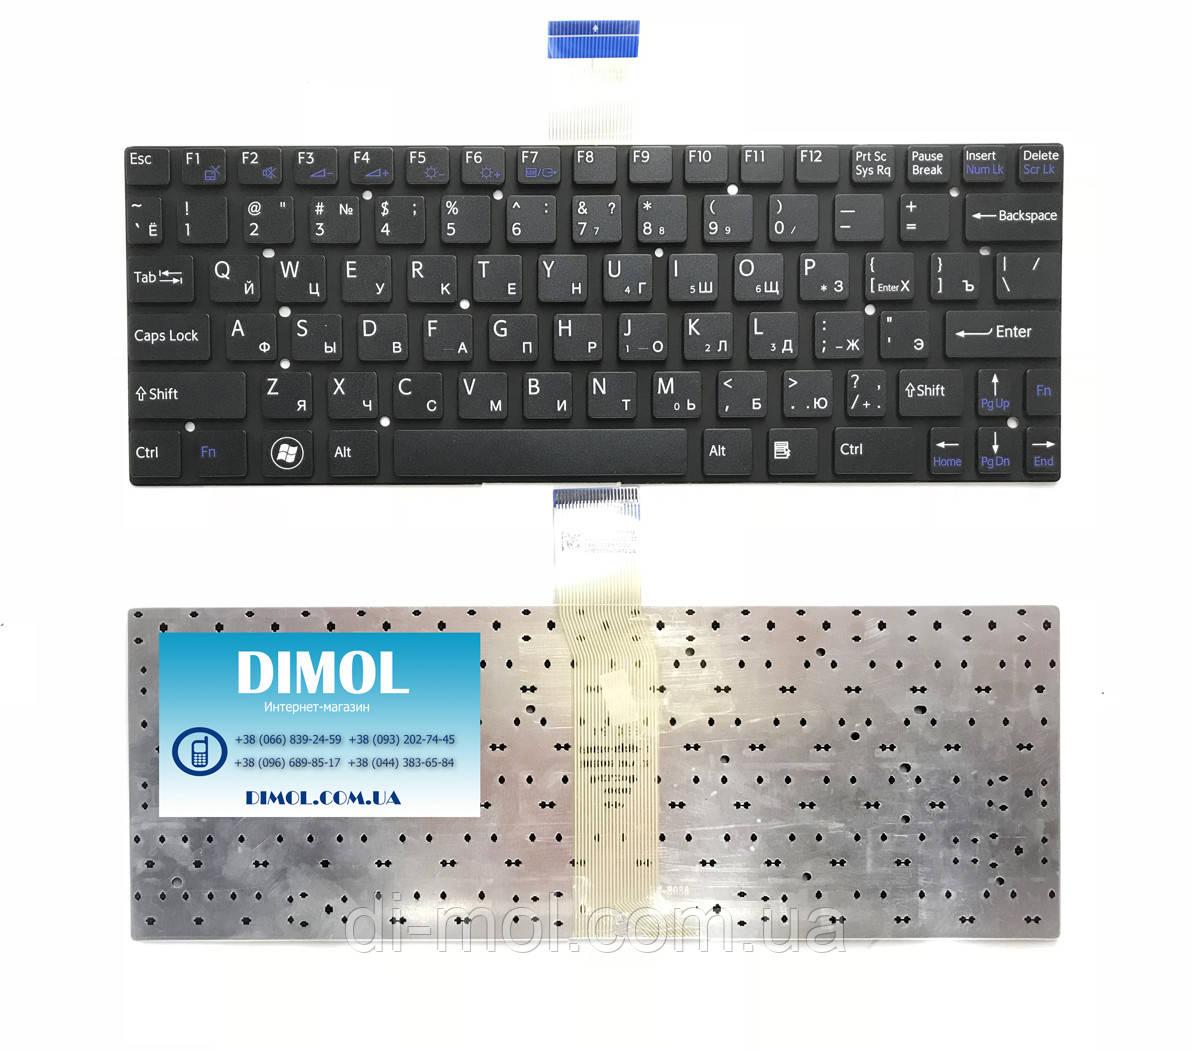 Оригинальная клавиатура для ноутбука Sony Vaio T11, SVT11 series, rus, black